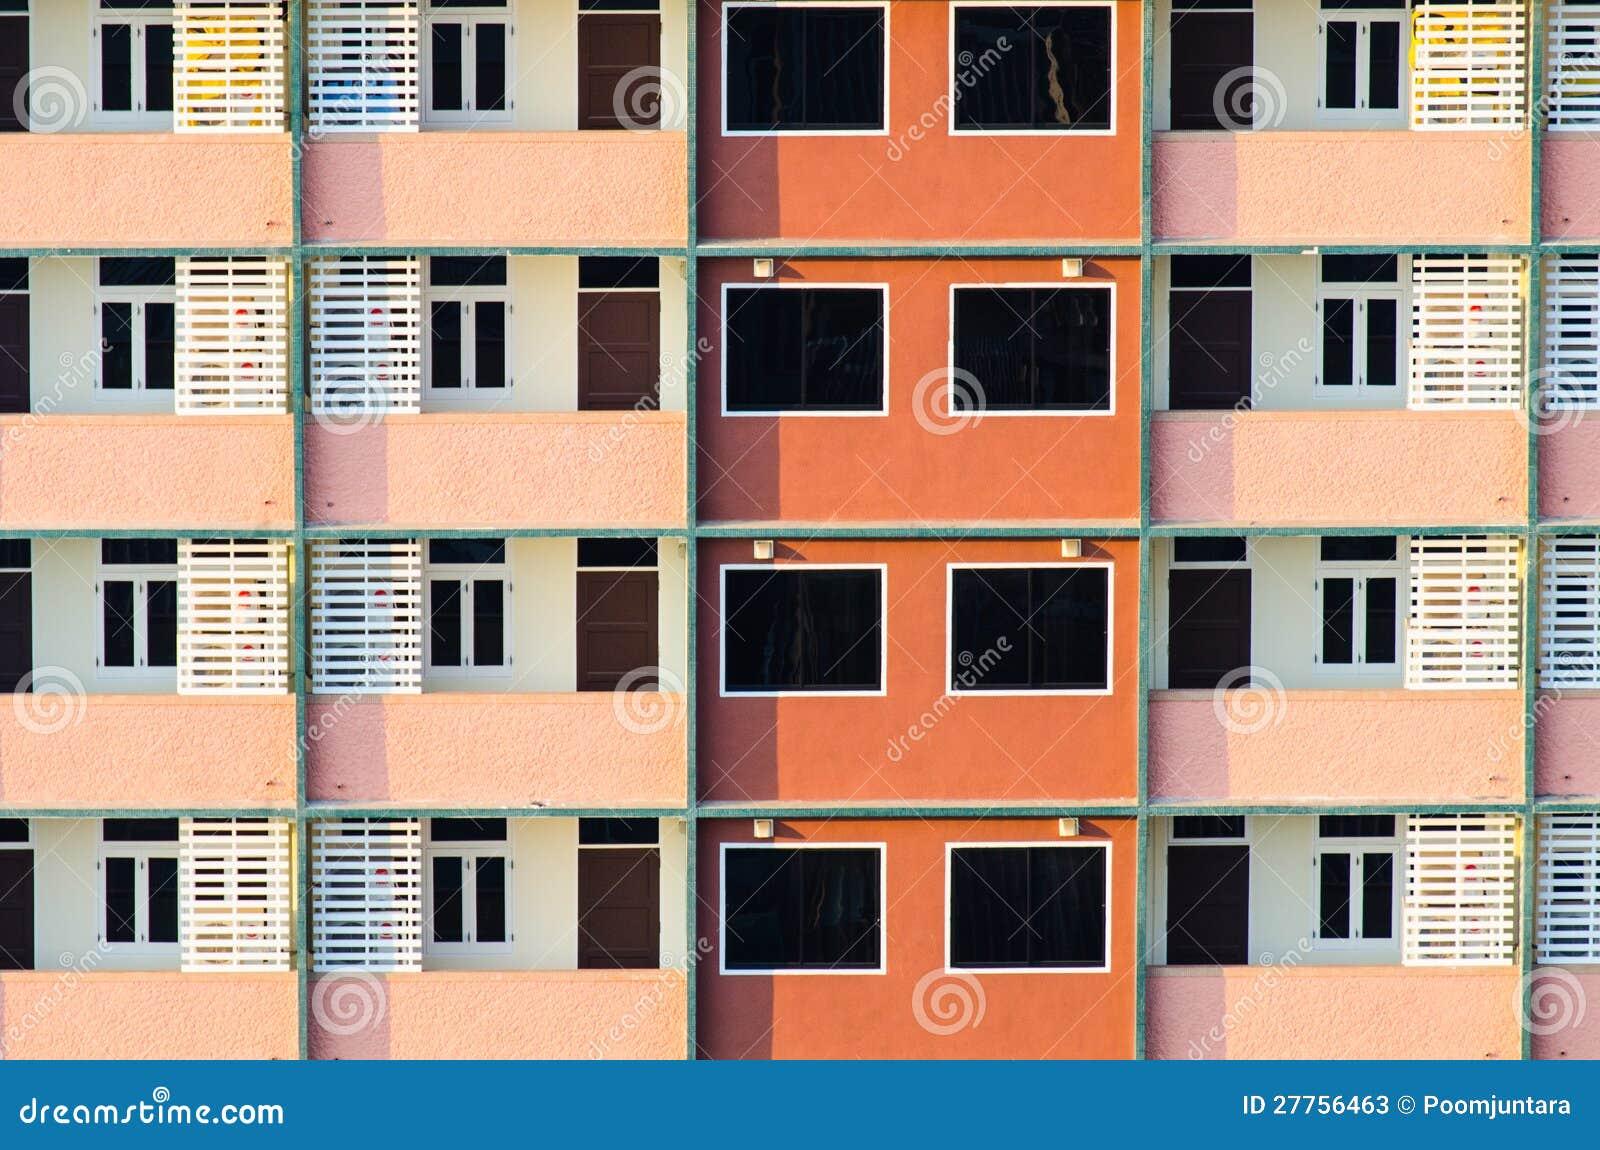 Building Pattern Stock Photos - Image: 27756463